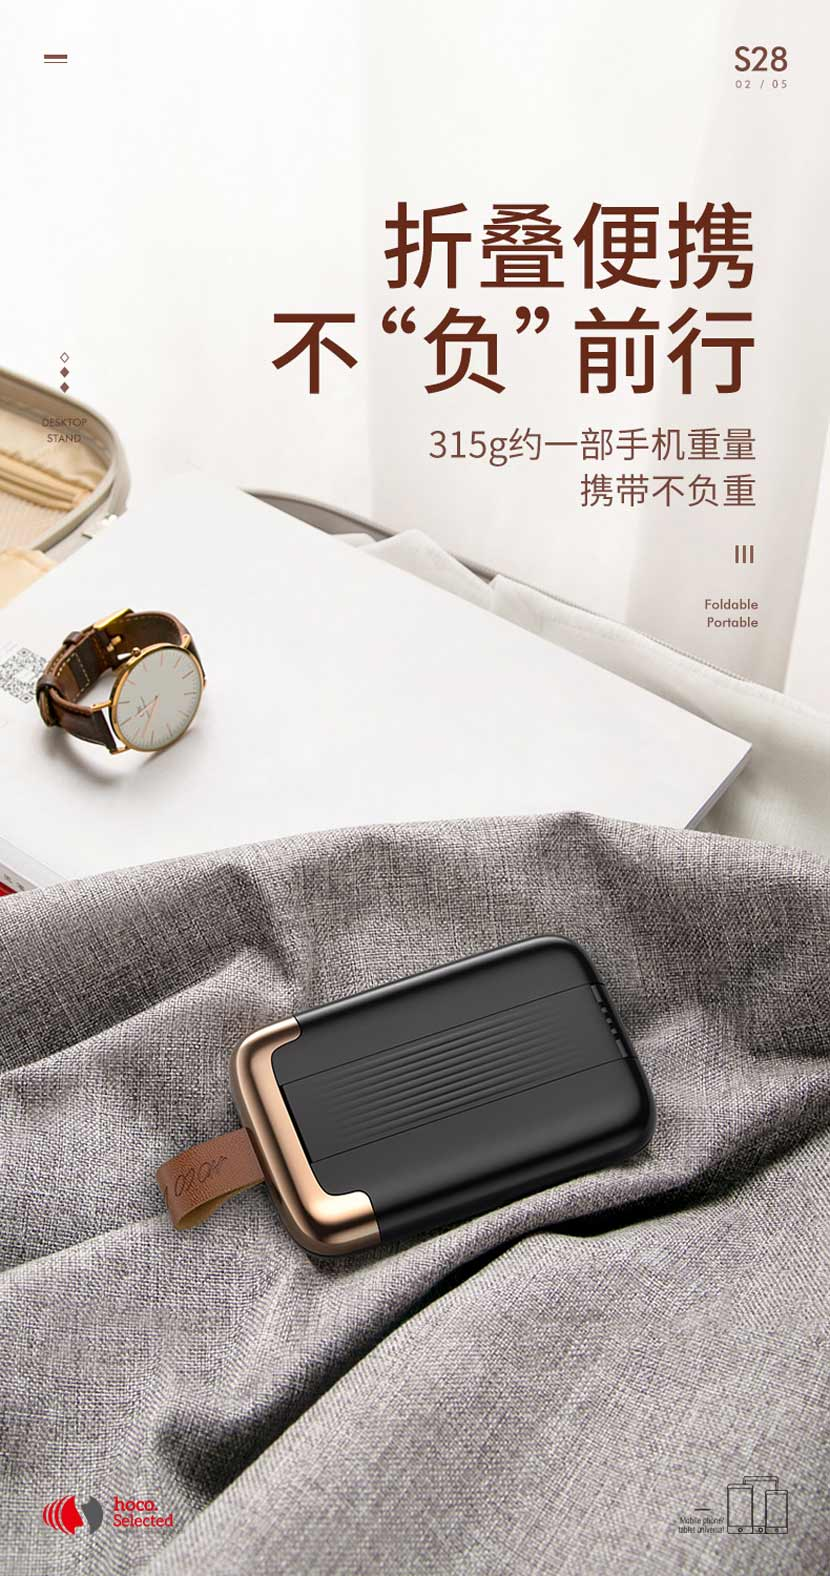 hoco selected news s28 dawn folding desktop stand portable cn